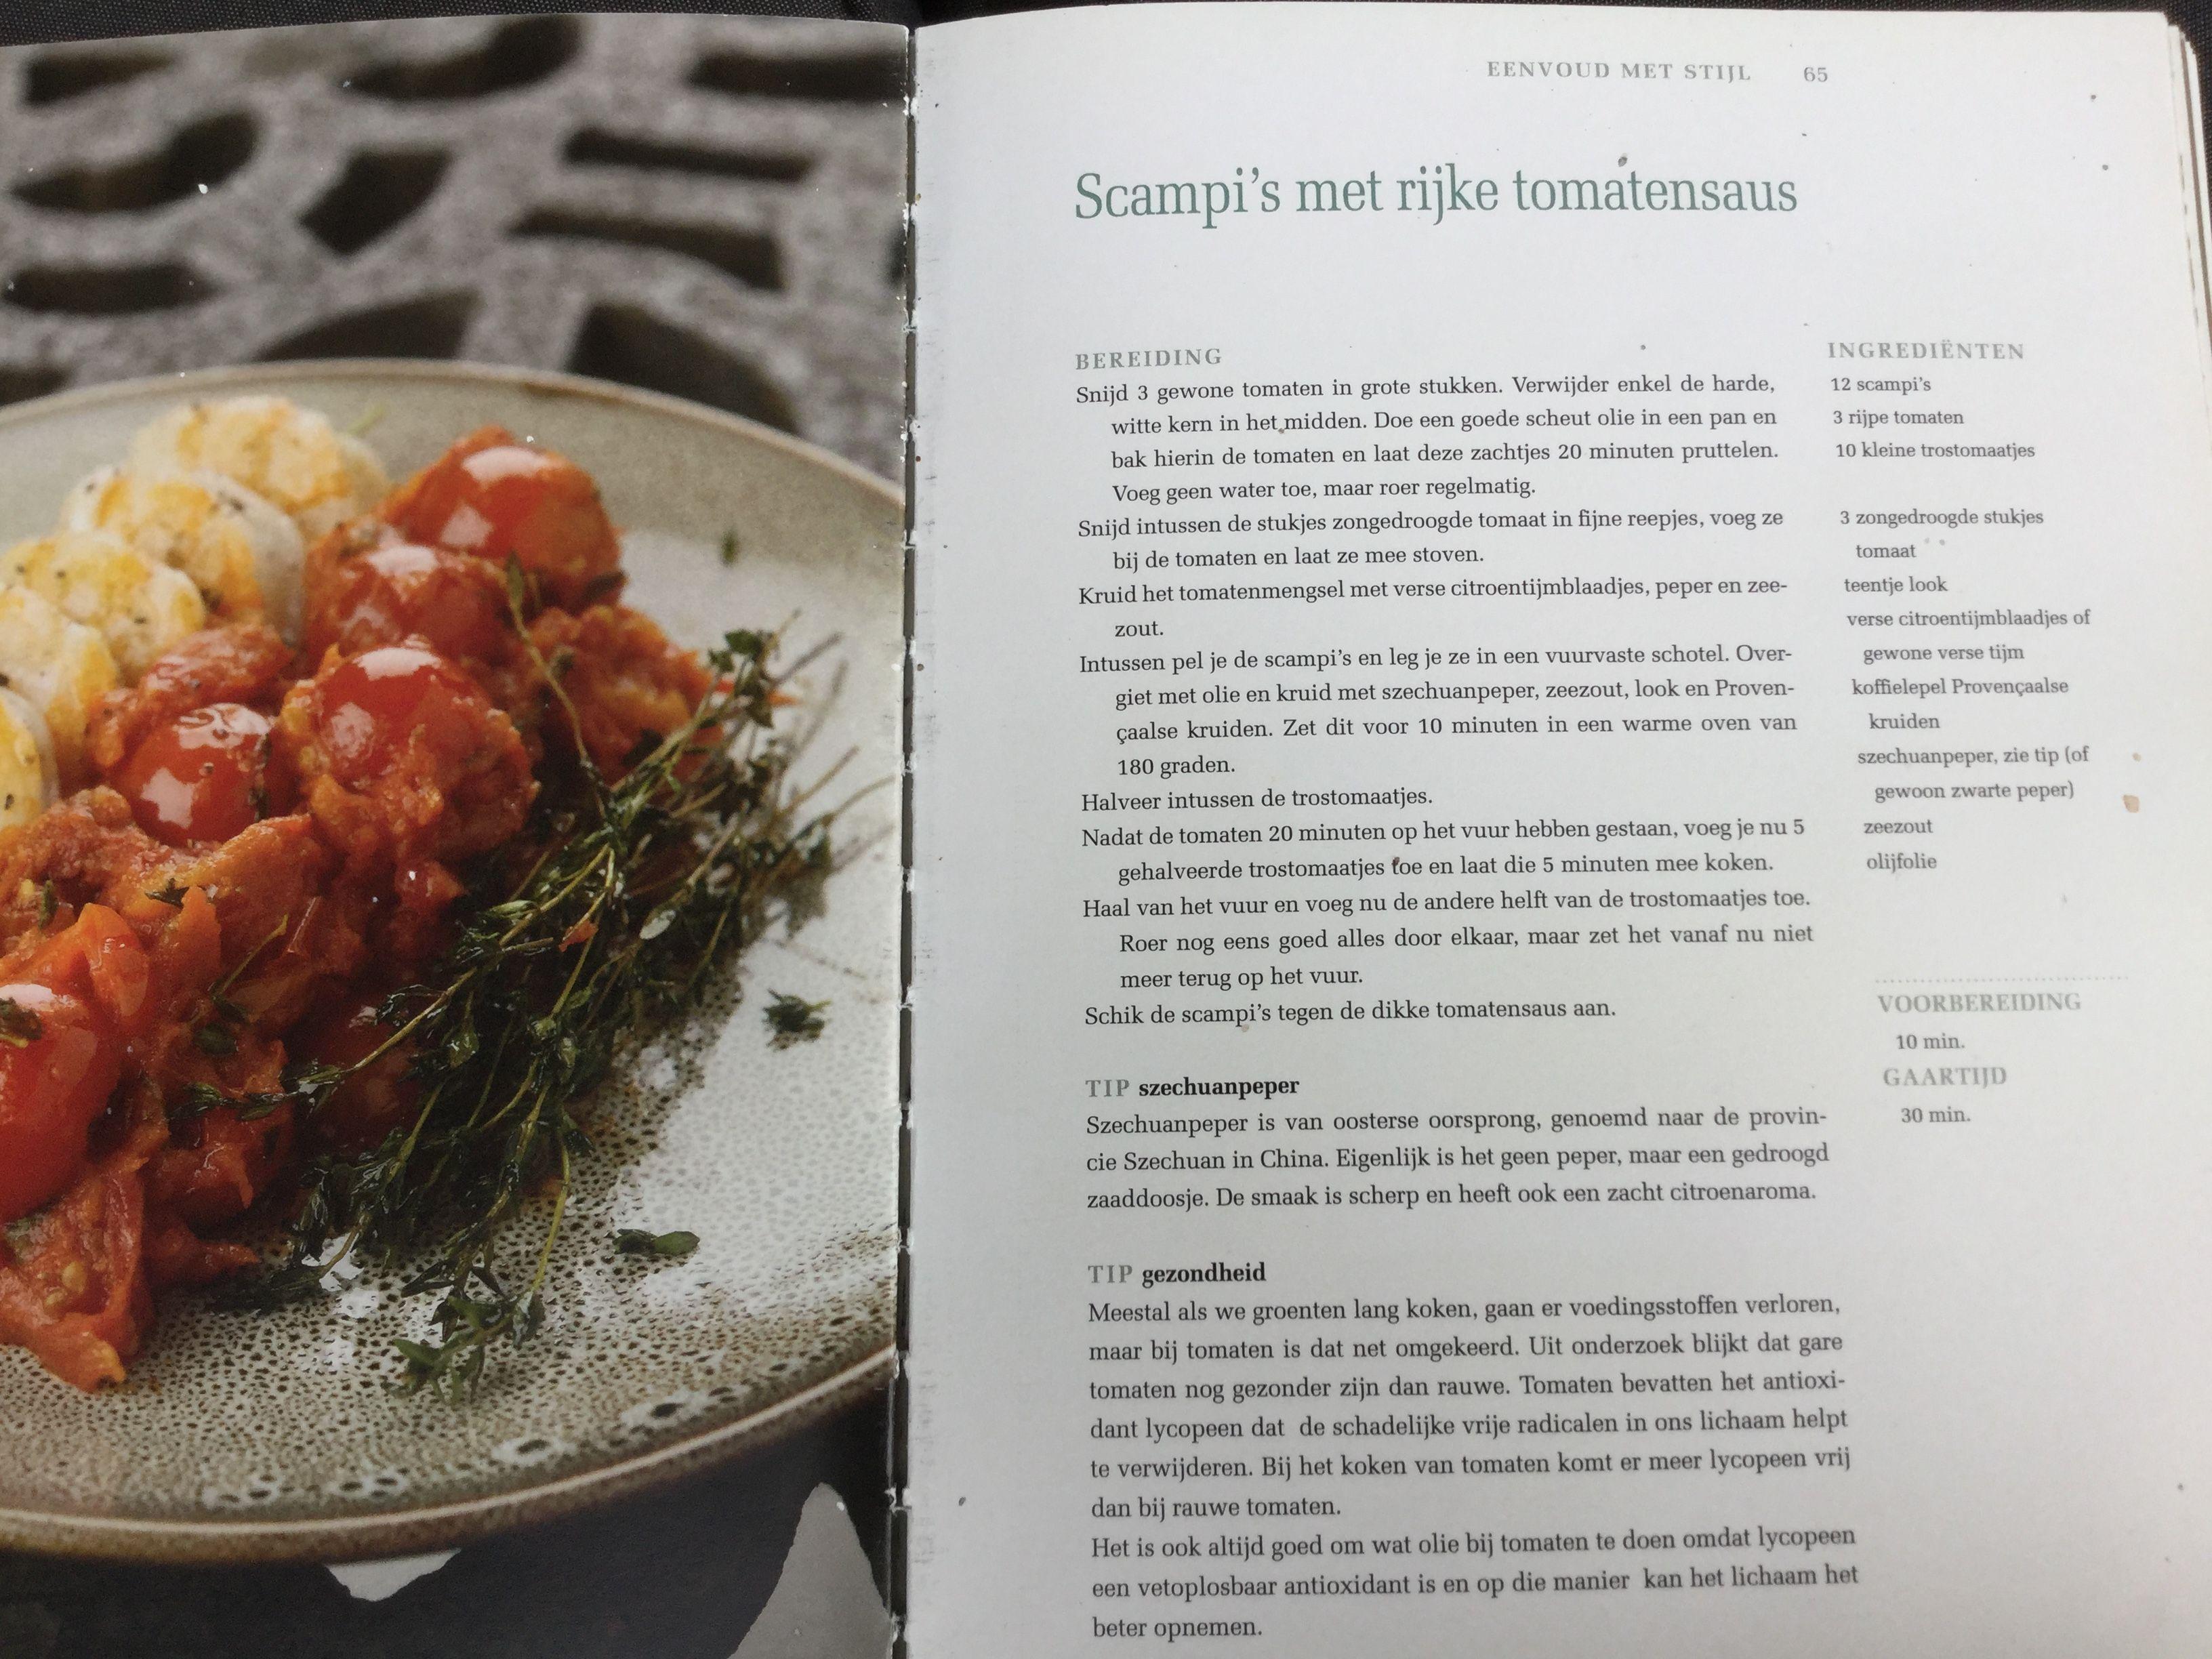 Mijn Pure Keuken : Scampis met rijke tomatensaus pascal naessens mijn pure keuken